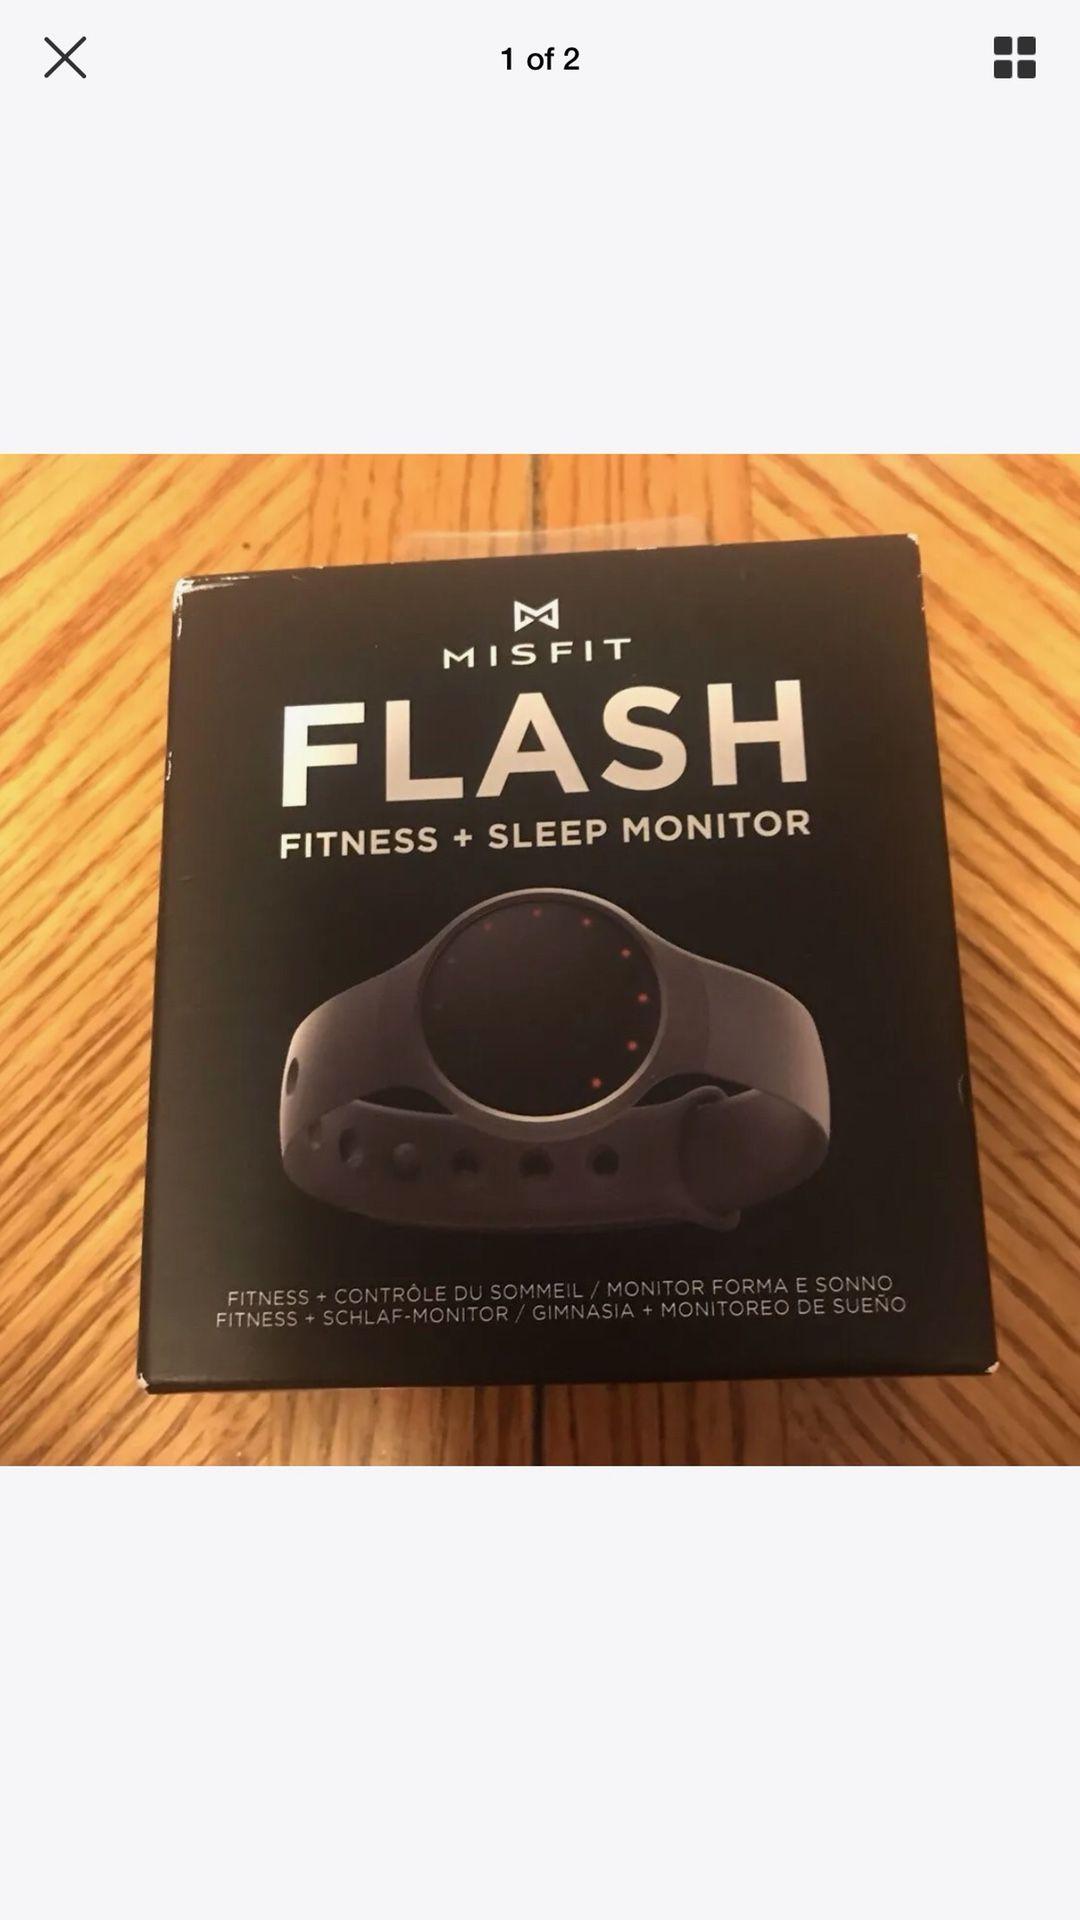 Flash fitness and sleep monitor